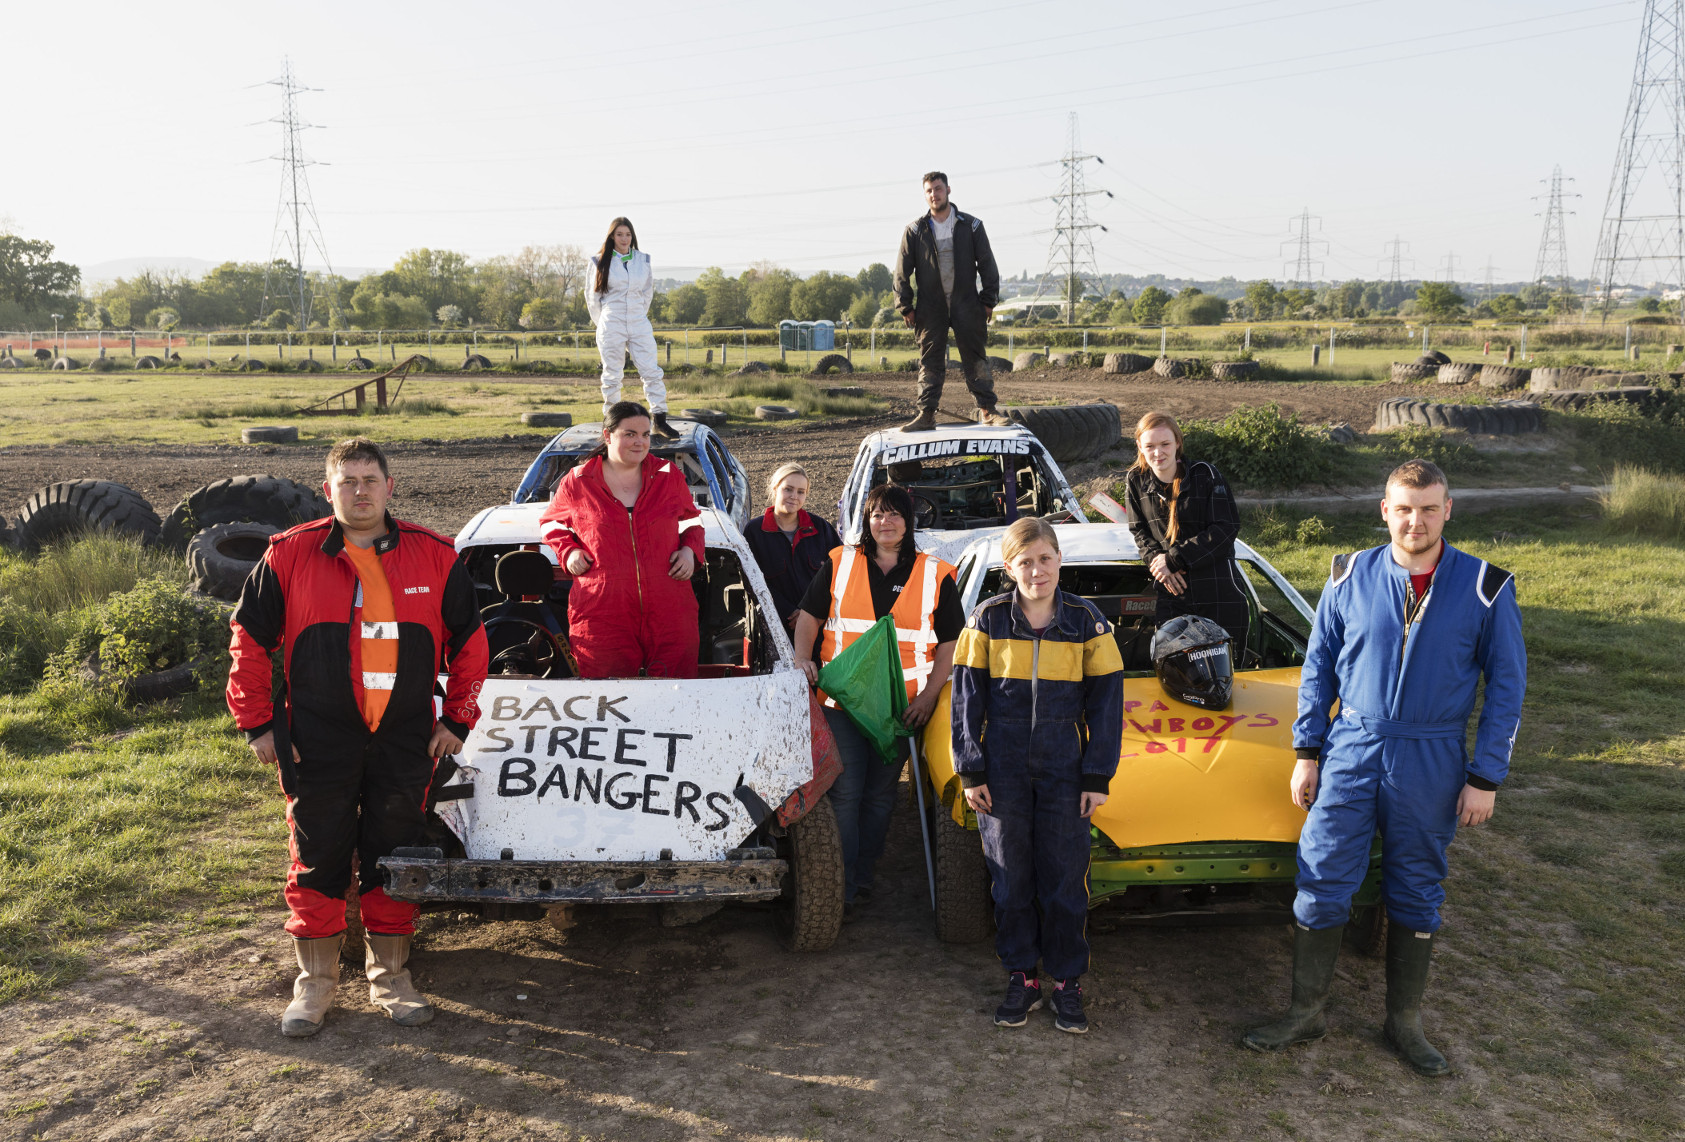 BBC Oneness, Banger Racing, St Brides, Photographer: Martin Parr